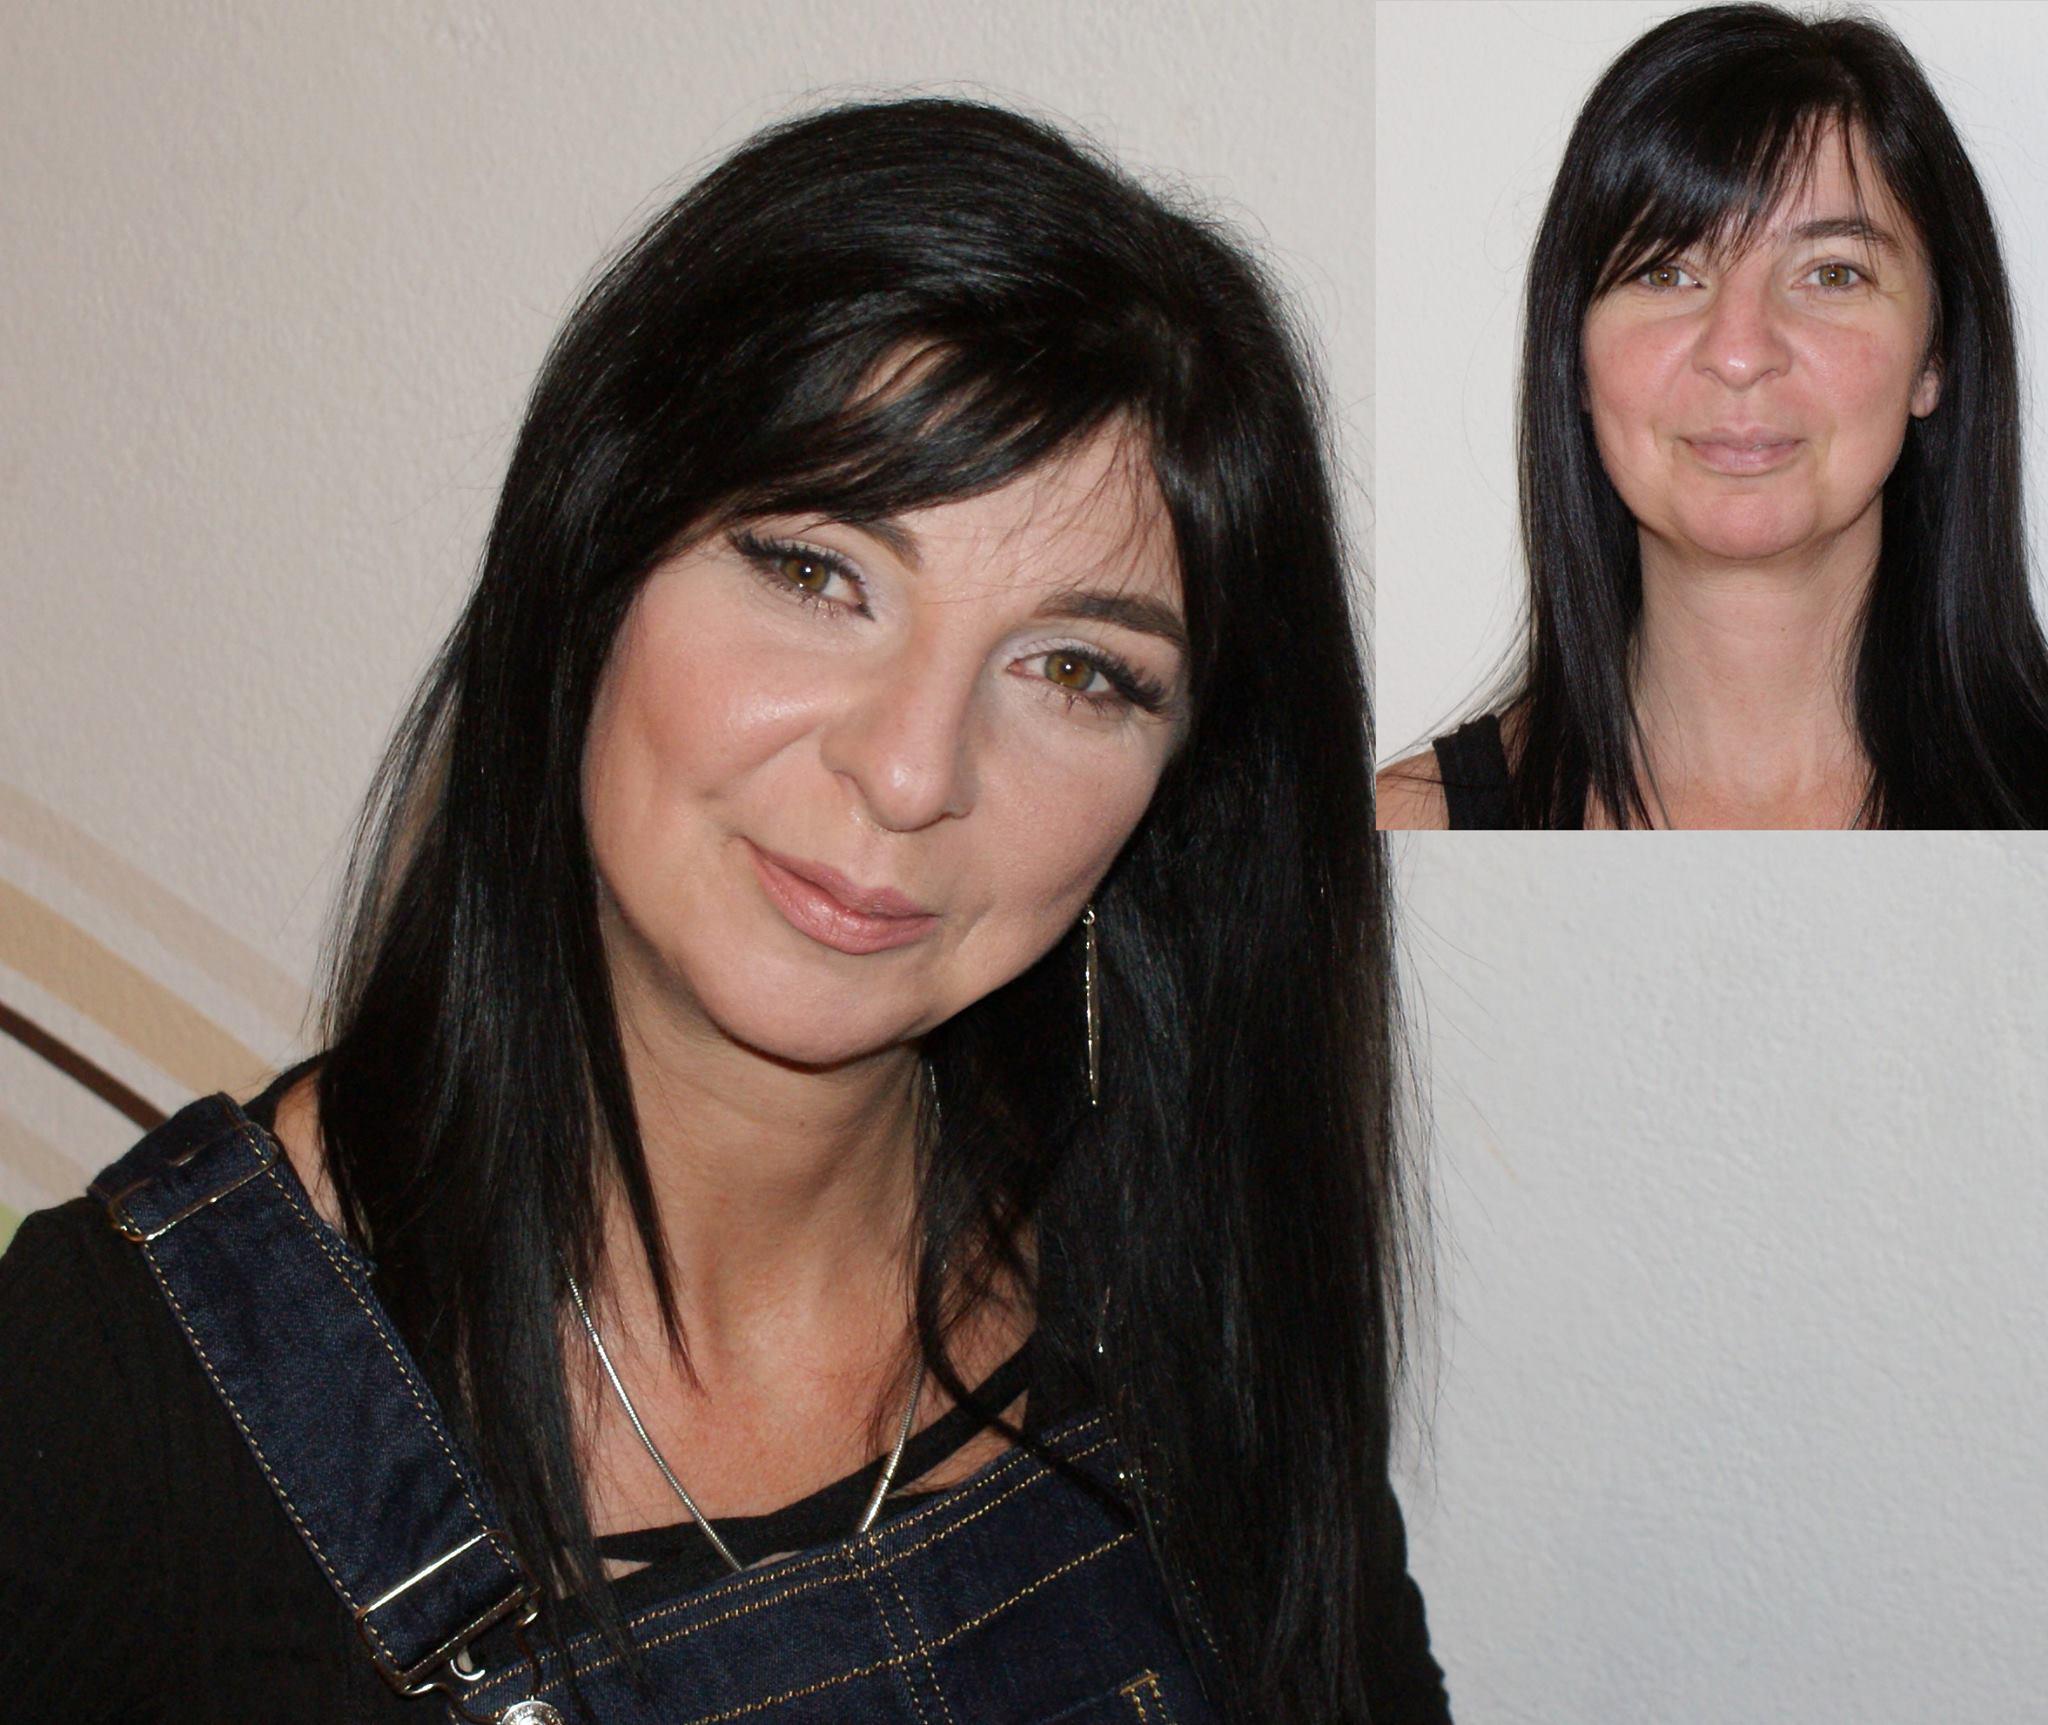 Claudia Vorher / Nachher